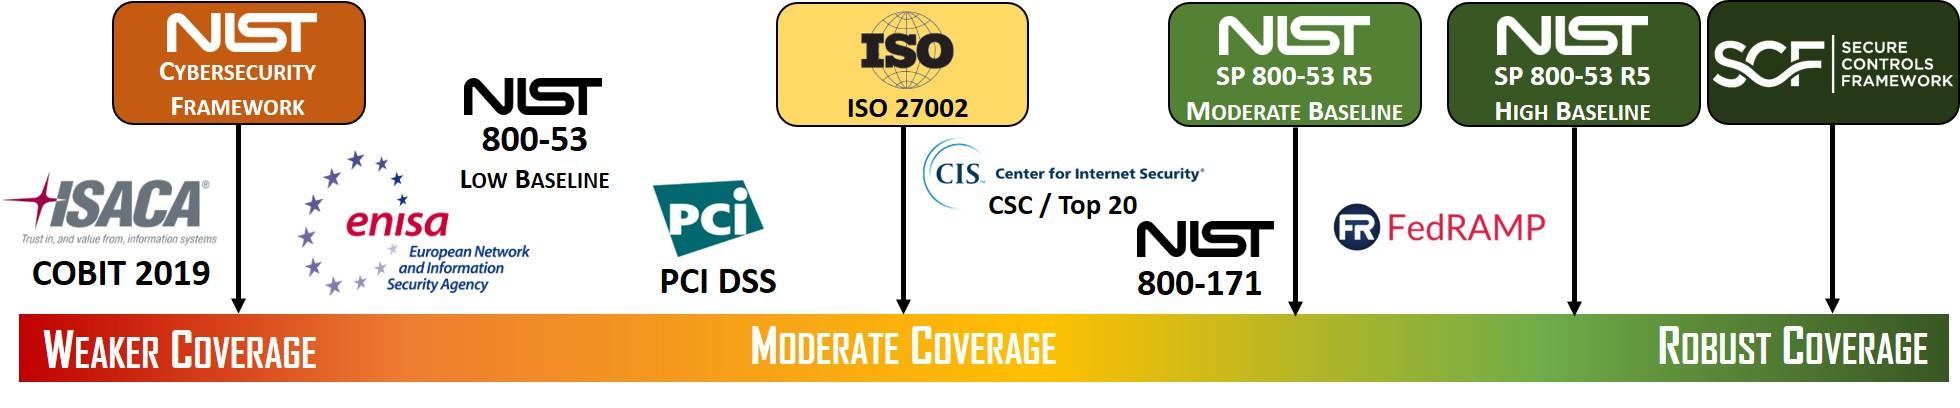 2020-cybersecurity-frameworks-comparison-nist-csf-vs-iso-27002-vs-nist-800-53-r5-vs-scf.jpg